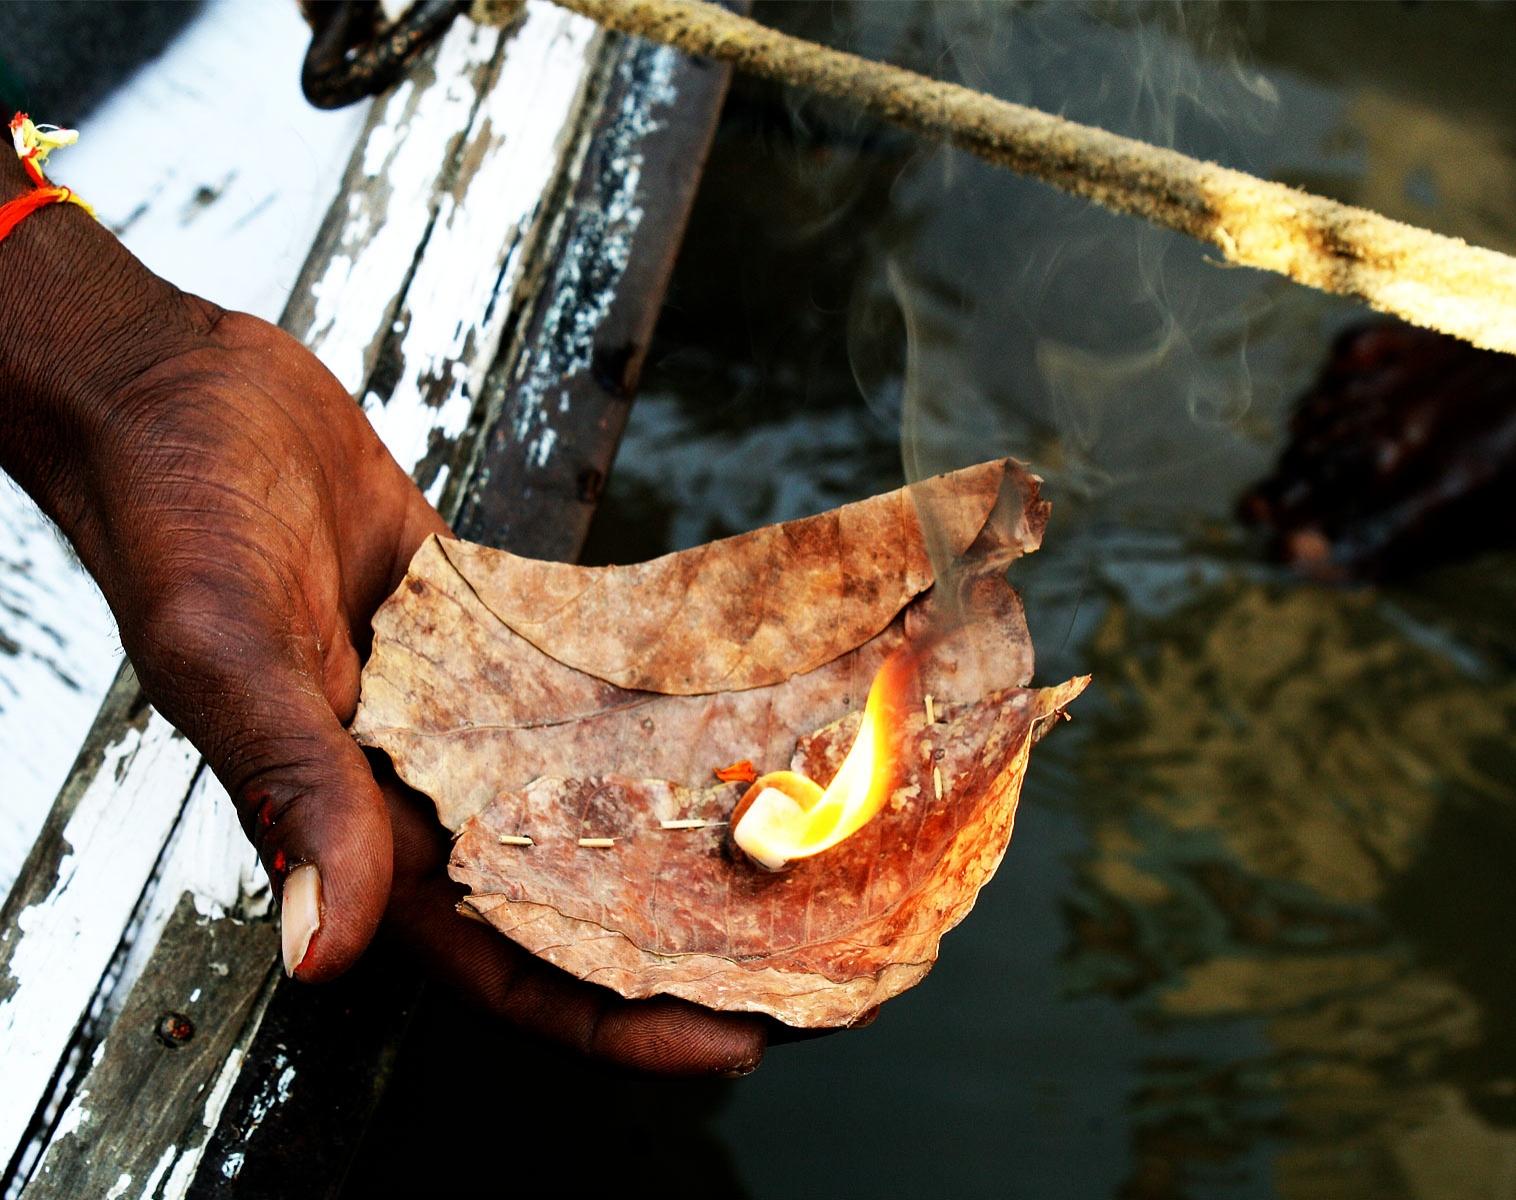 Inde  Descente sacrée du Gange   Découverte Navigation Balade nature